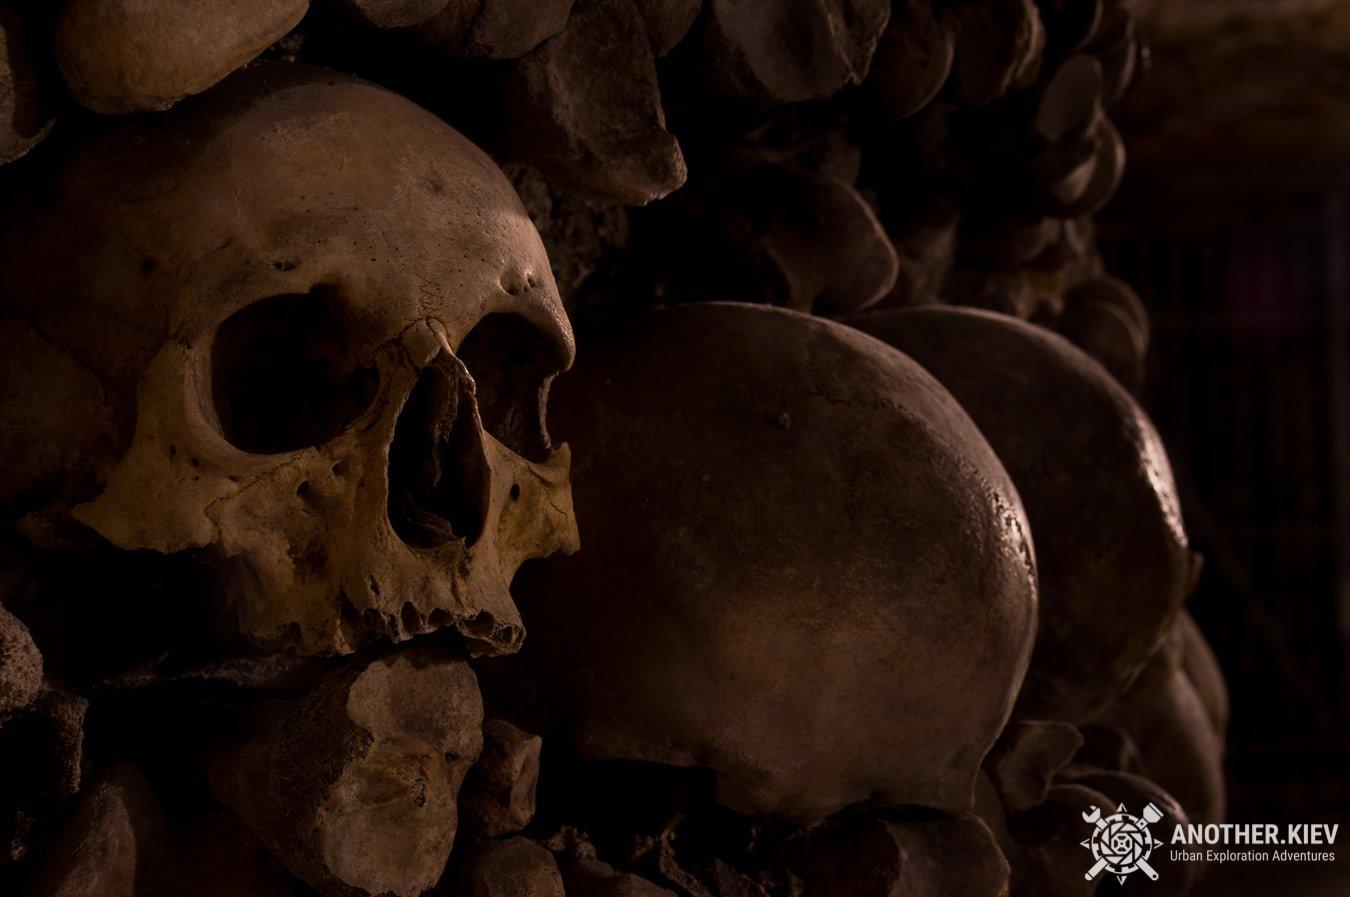 paris-catacombs-dark-urbex-tour-3 PARIS CATACOMBS DARK TOUR